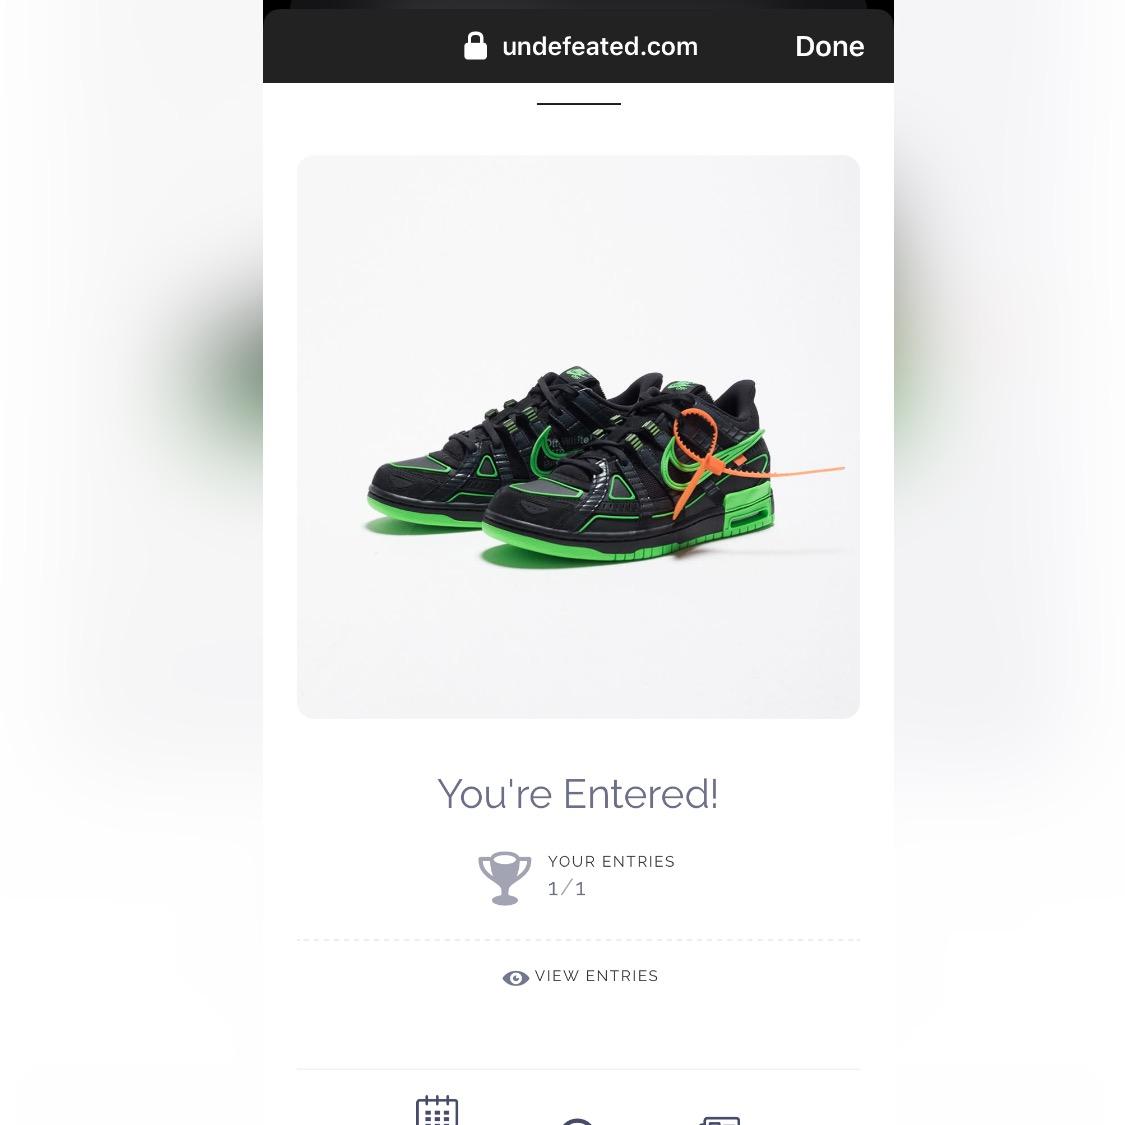 Got my entry in!! Good luck to everybody!!  #datSTROKElife  . . . . . #Kickstagram #Supreme #Dunksb #Rubberdunks #Hypebeast #Kicksonfire #Offwhite #Nikesbdunk #Sbsonly #Nikedunk #Sneakerhead #Nicekicks #Nikedunks #Sneakers #Nike #Dunks #Nikesb #Sbdunks #Sb #Sbcollector https://t.co/PIhkQGsiuG